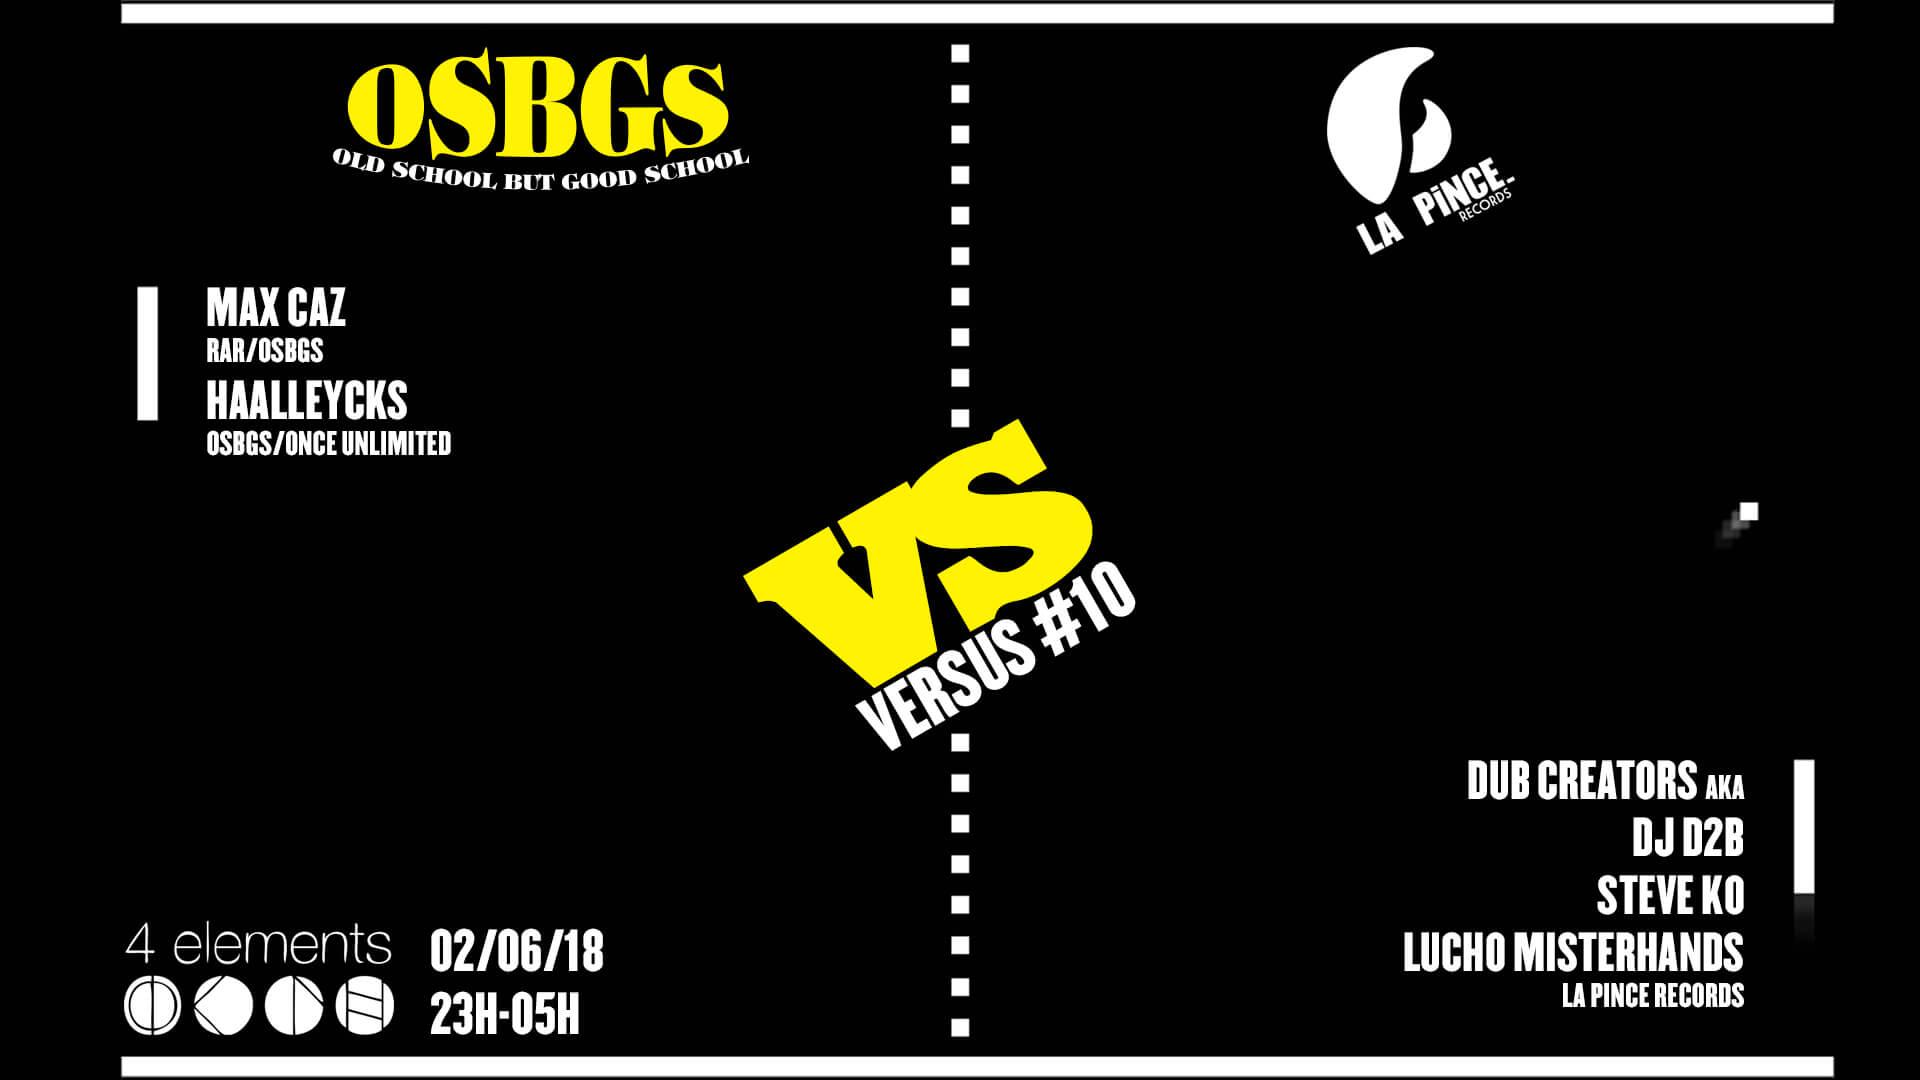 Versus 10 OSBGS VS La Pince Records